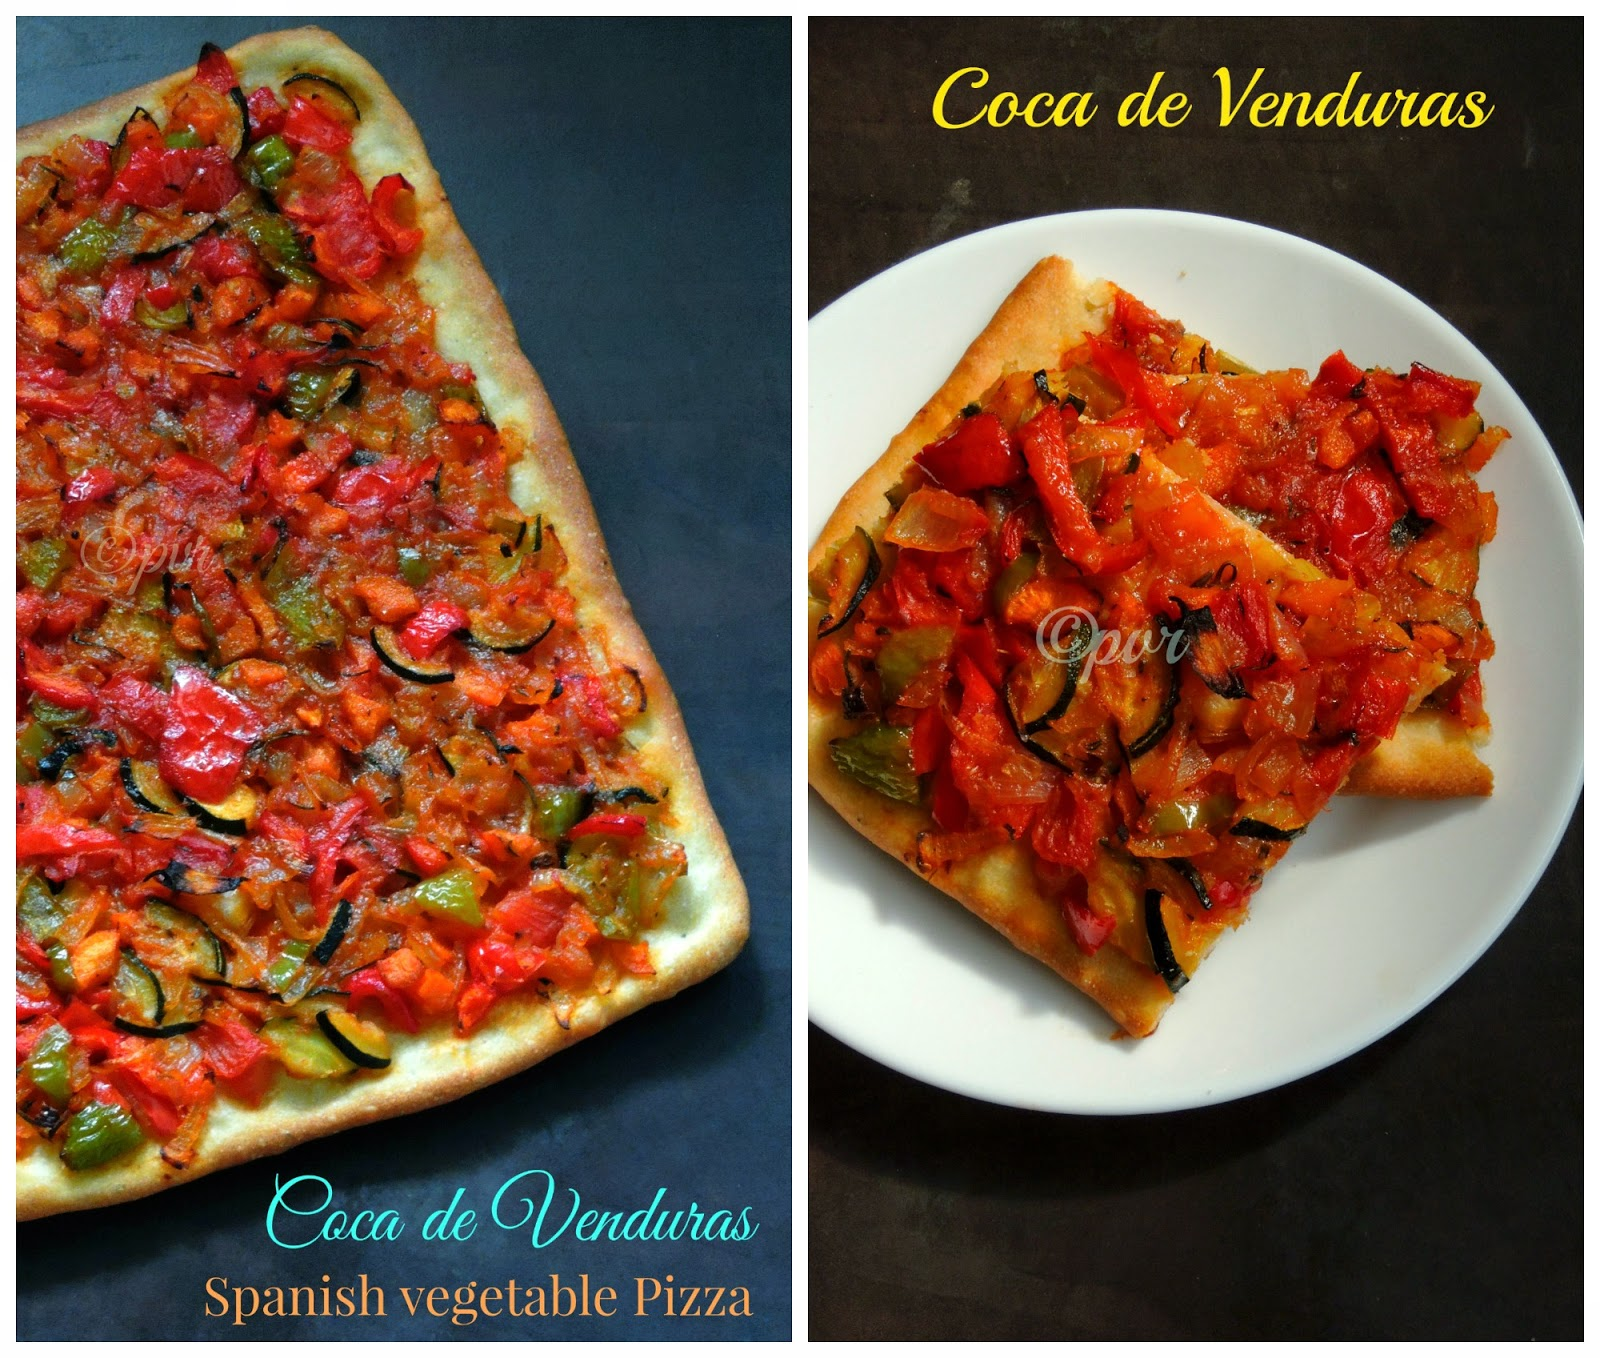 Coca de Venduras, vegan catalan vegetable pizza